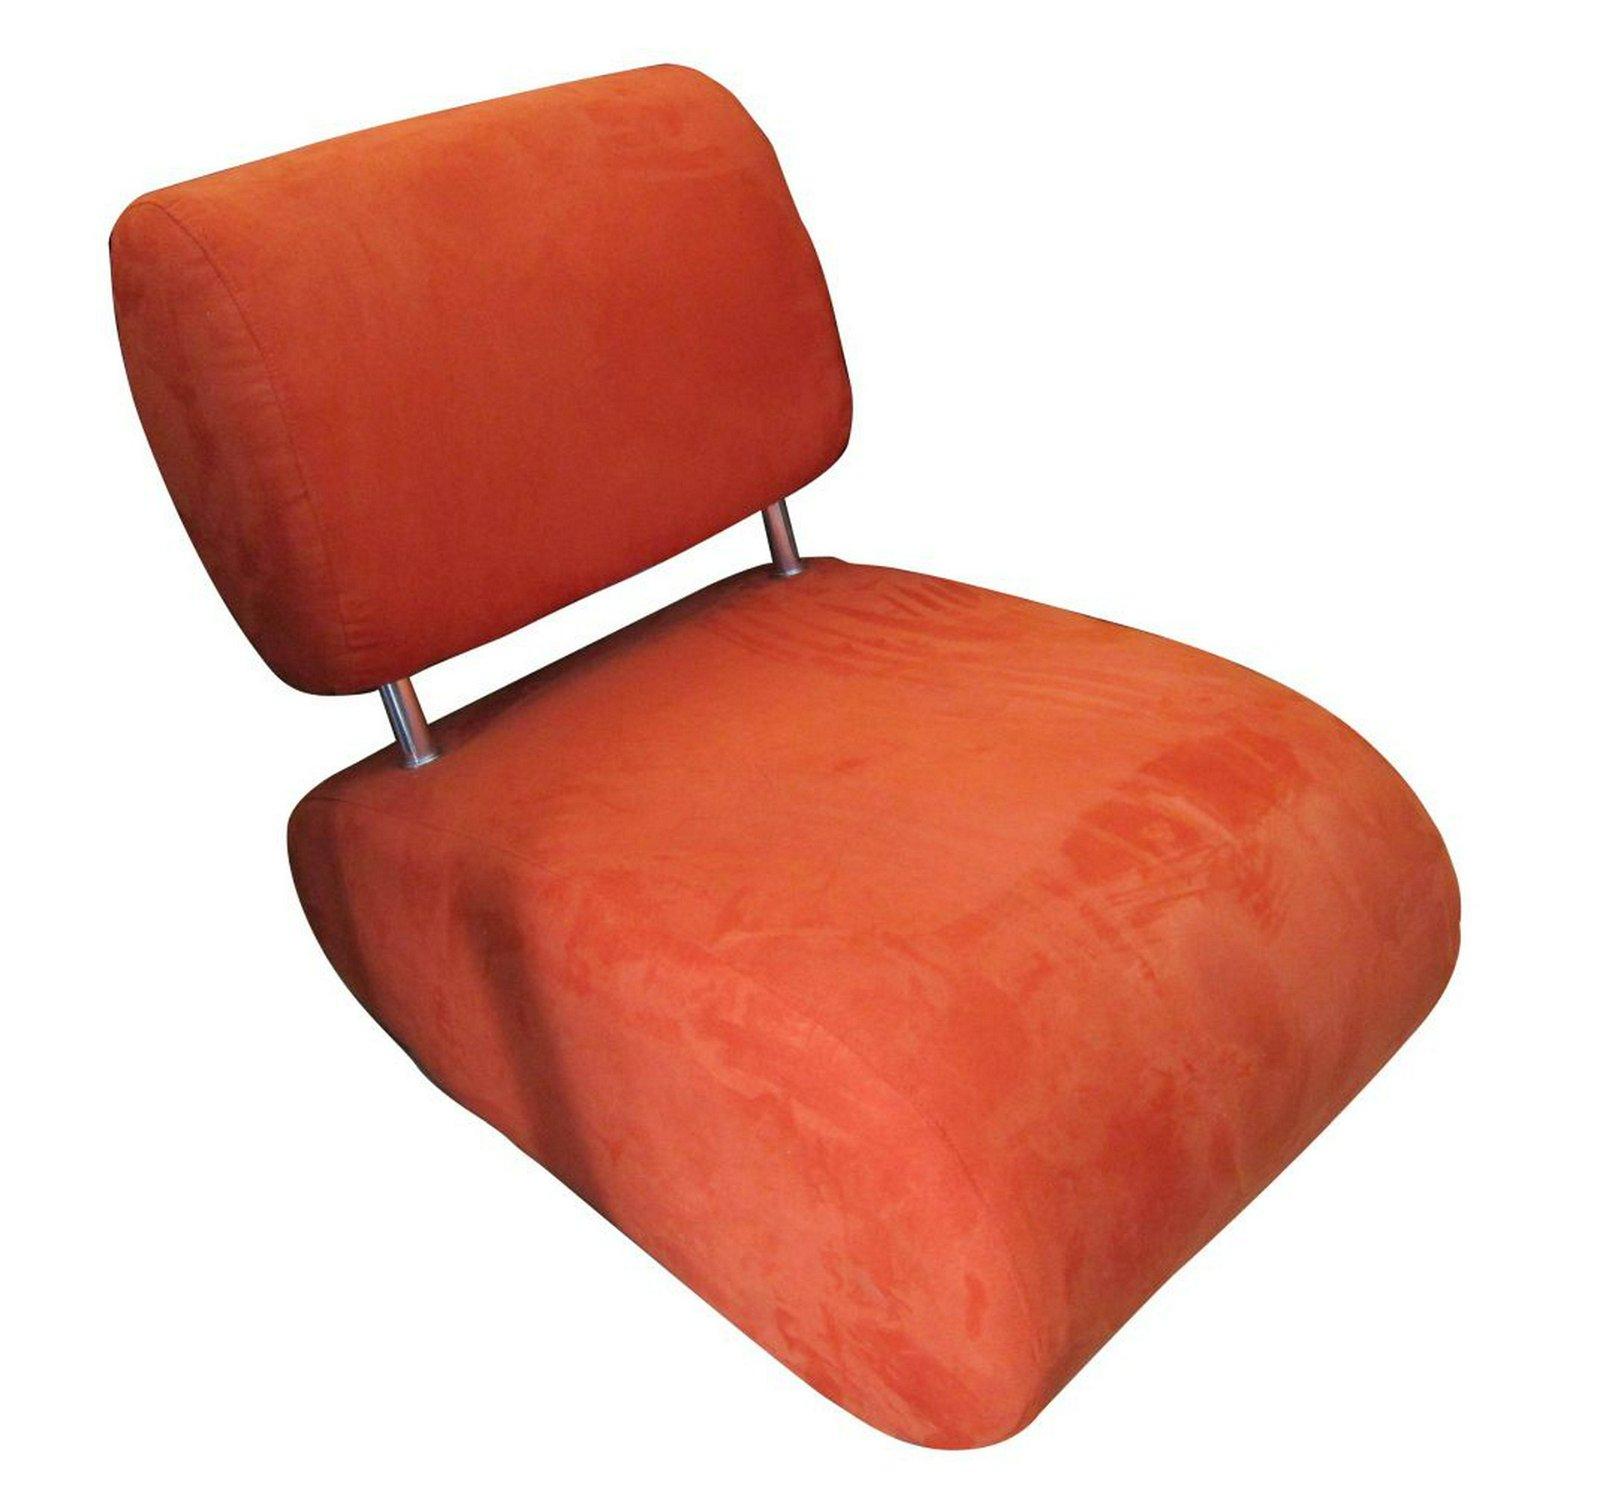 Vintage chair of Italian design